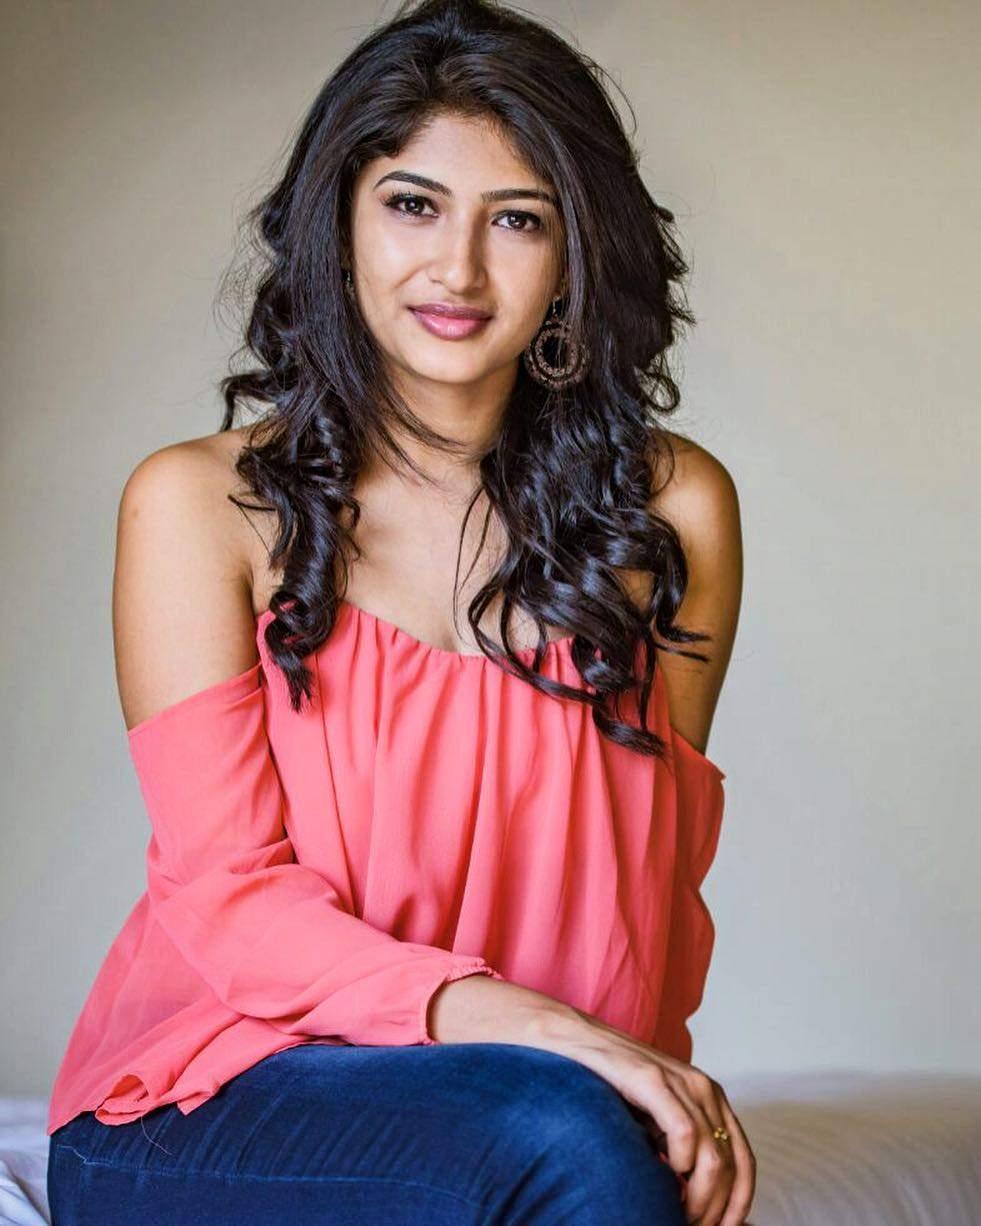 Pics Bucket Actress Roshini Prakash Latest HD Photos and wallpapers 981x1226